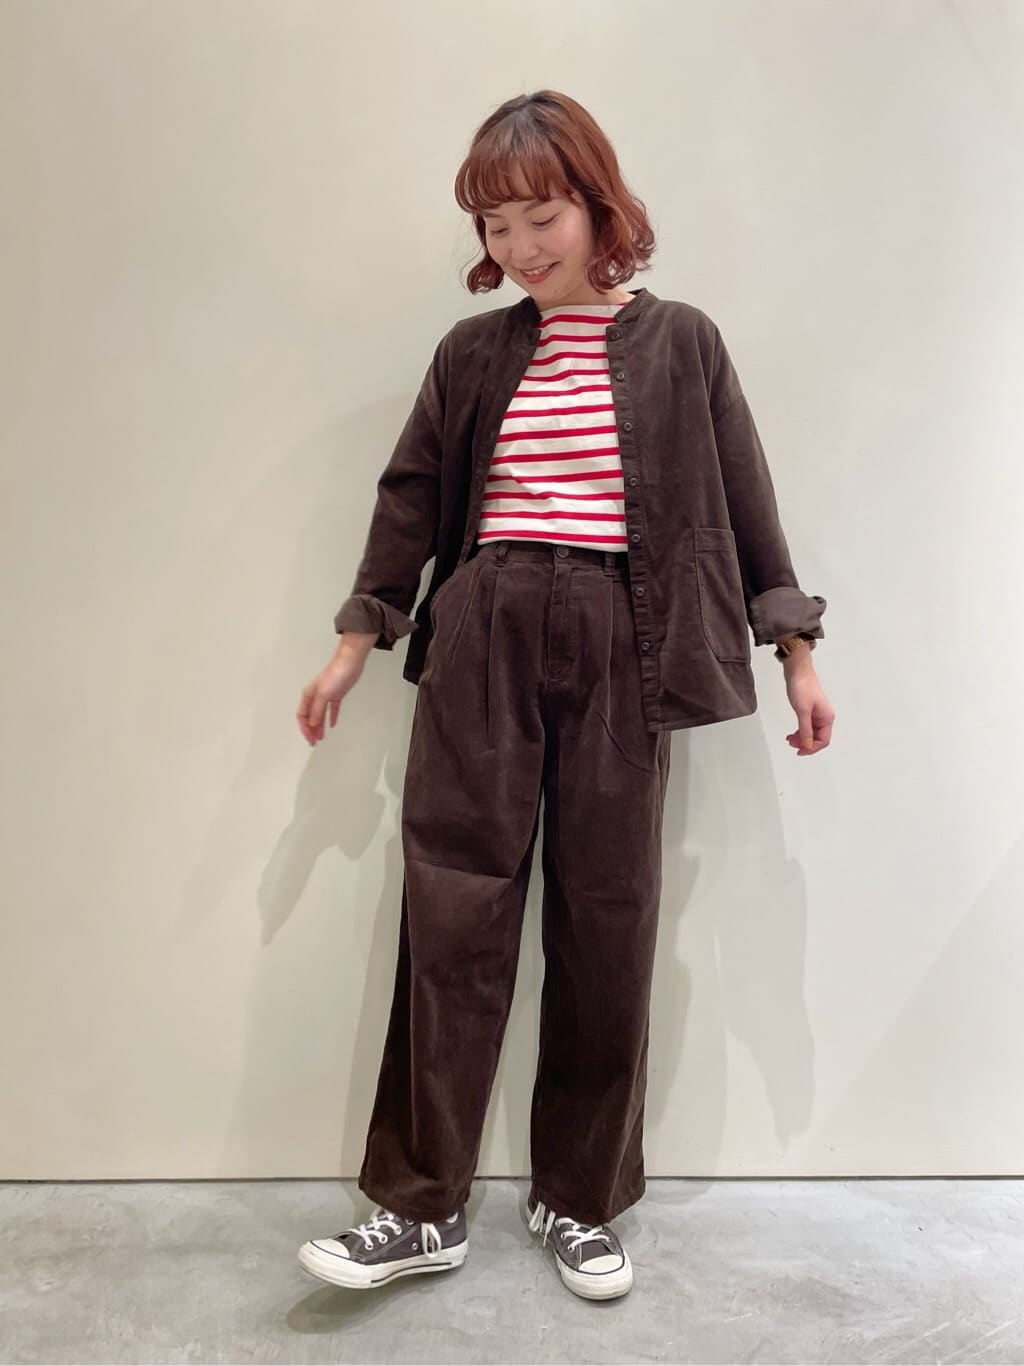 Dot and Stripes CHILD WOMAN CHILD WOMAN , PAR ICI 新宿ミロード 身長:160cm 2021.09.02